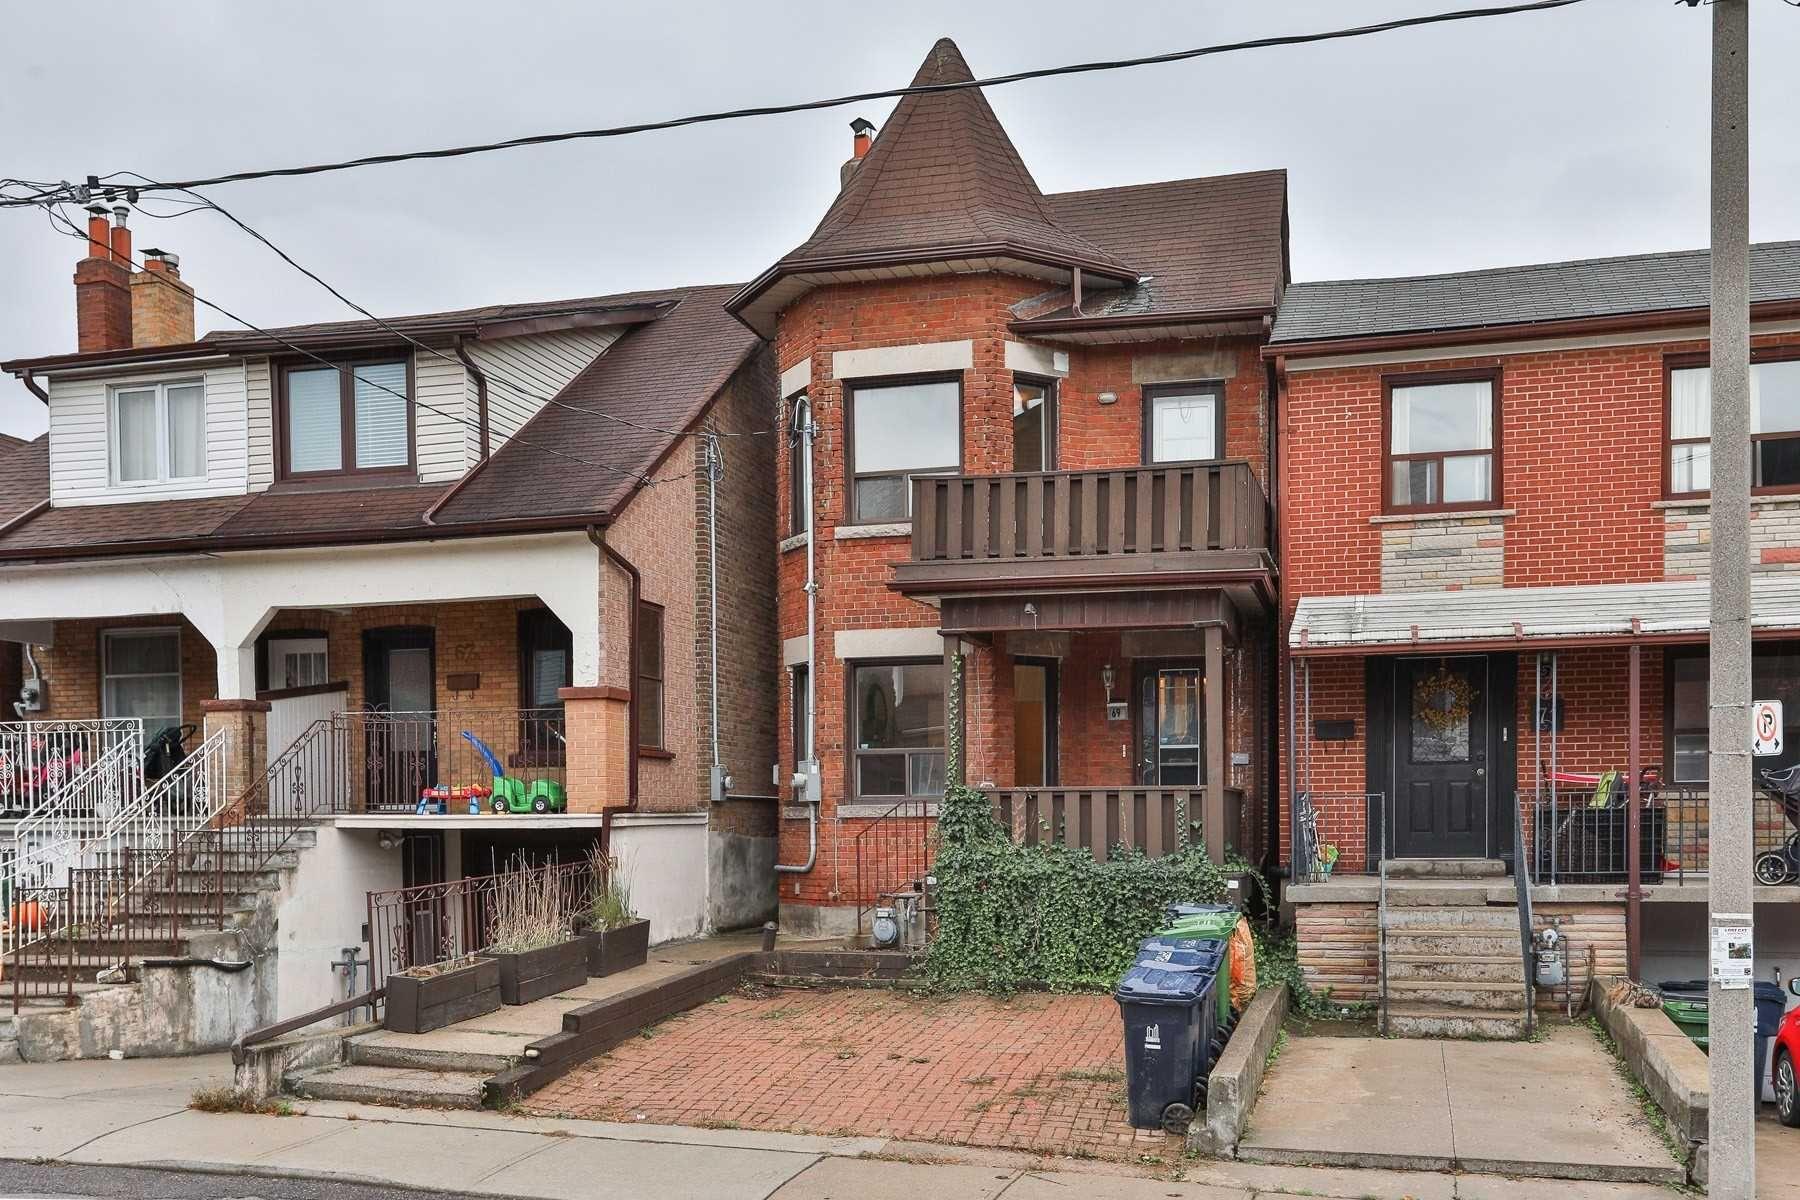 Main Photo: 69 Auburn Avenue in Toronto: Corso Italia-Davenport House (2-Storey) for sale (Toronto W03)  : MLS®# W4594421